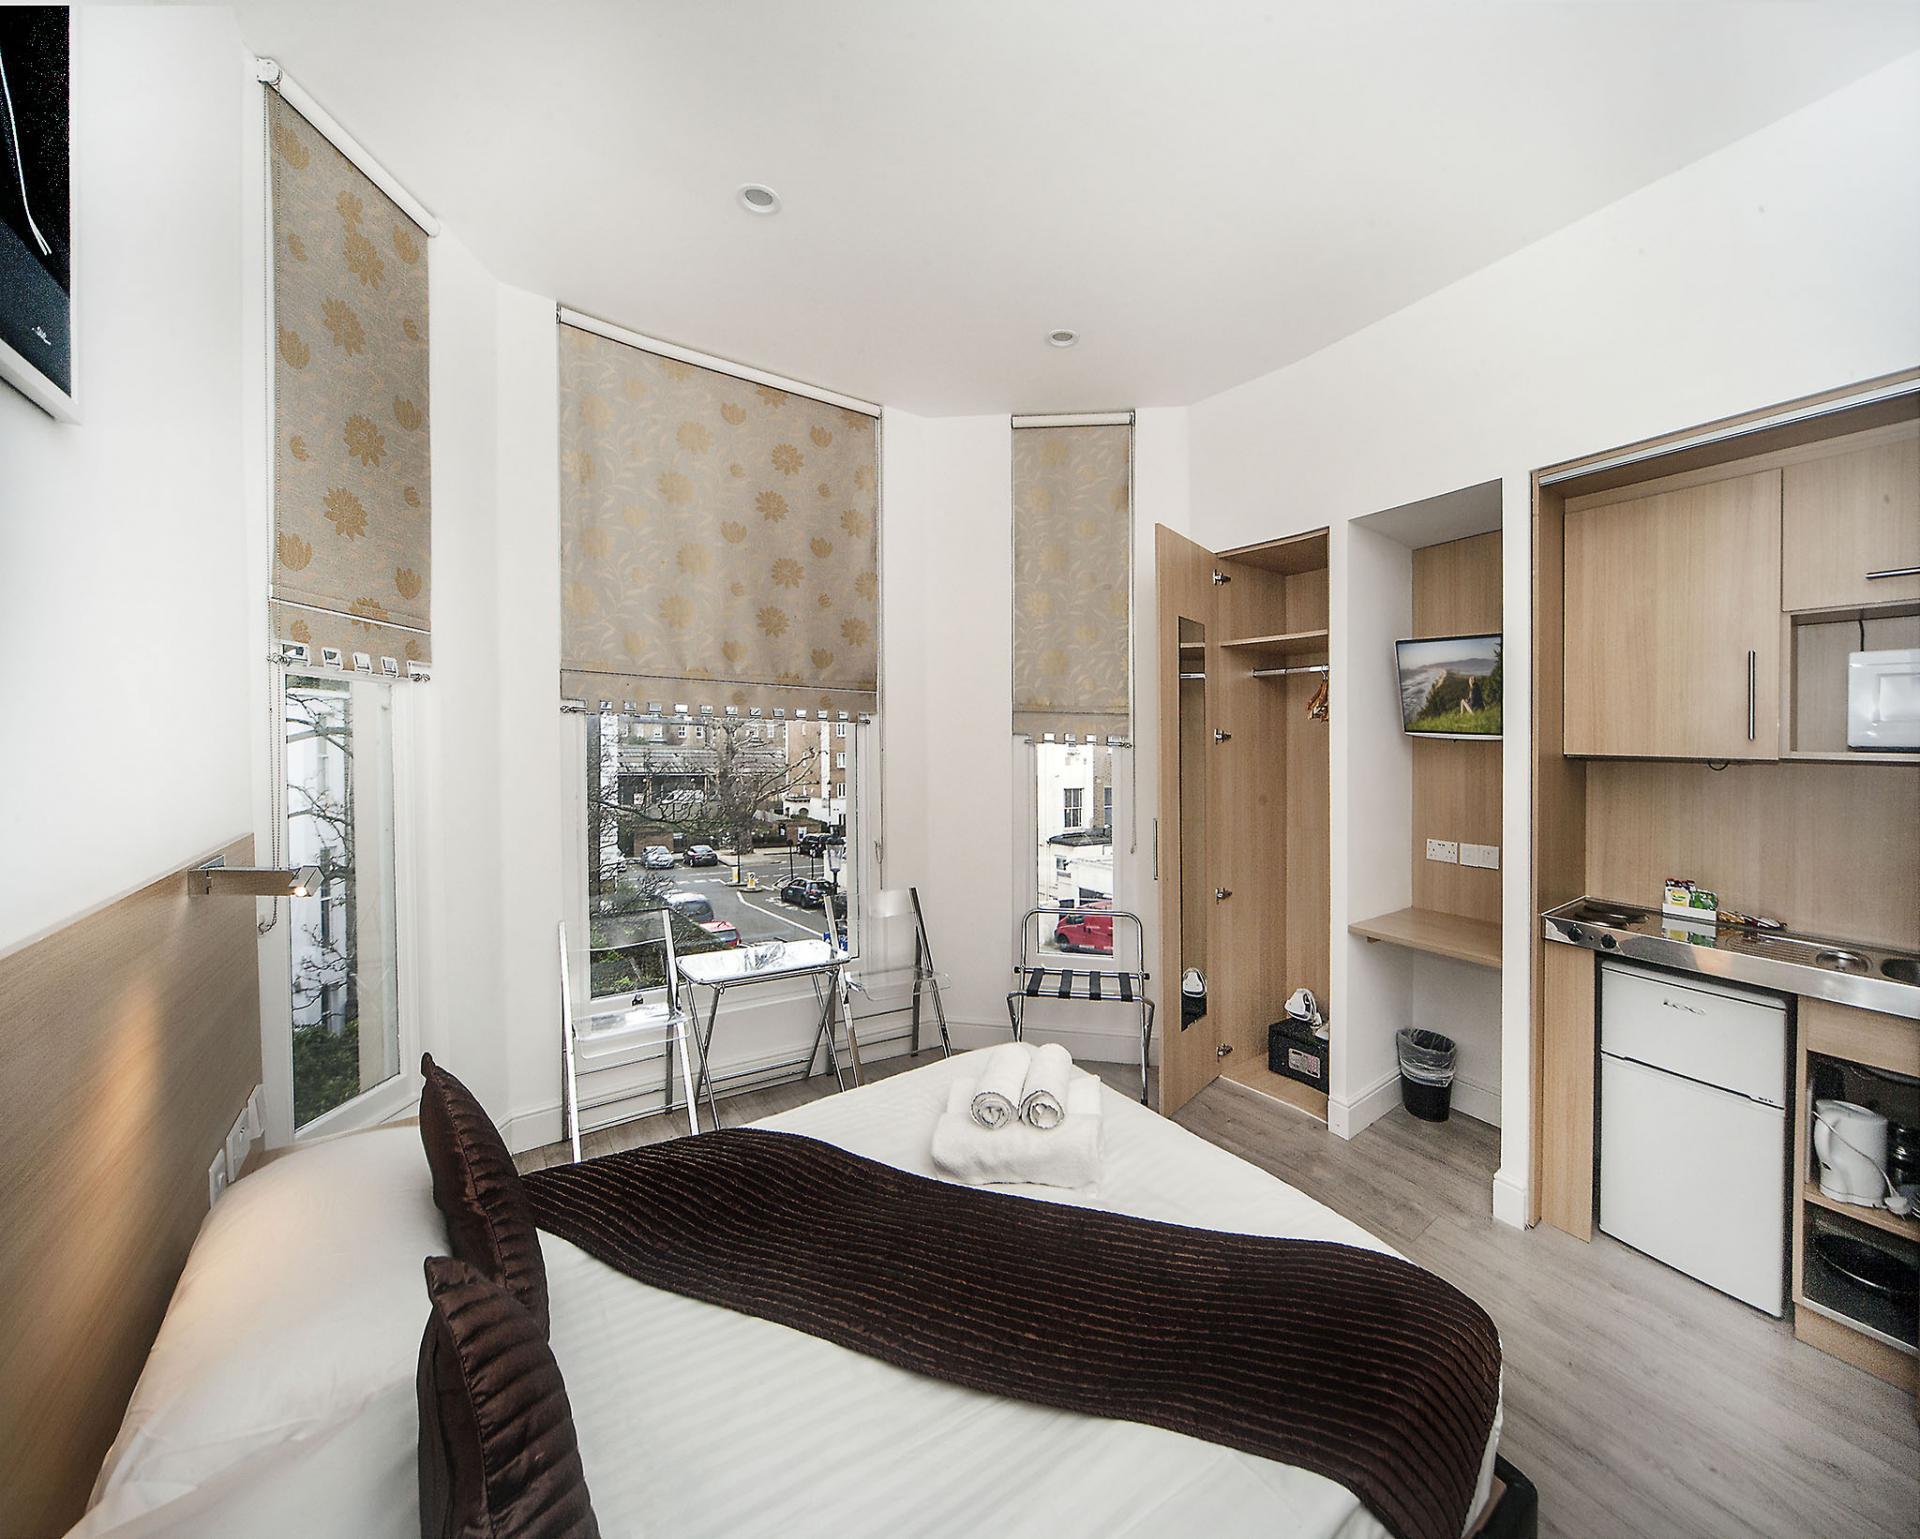 Studio at 88 Studios Kensington - Citybase Apartments